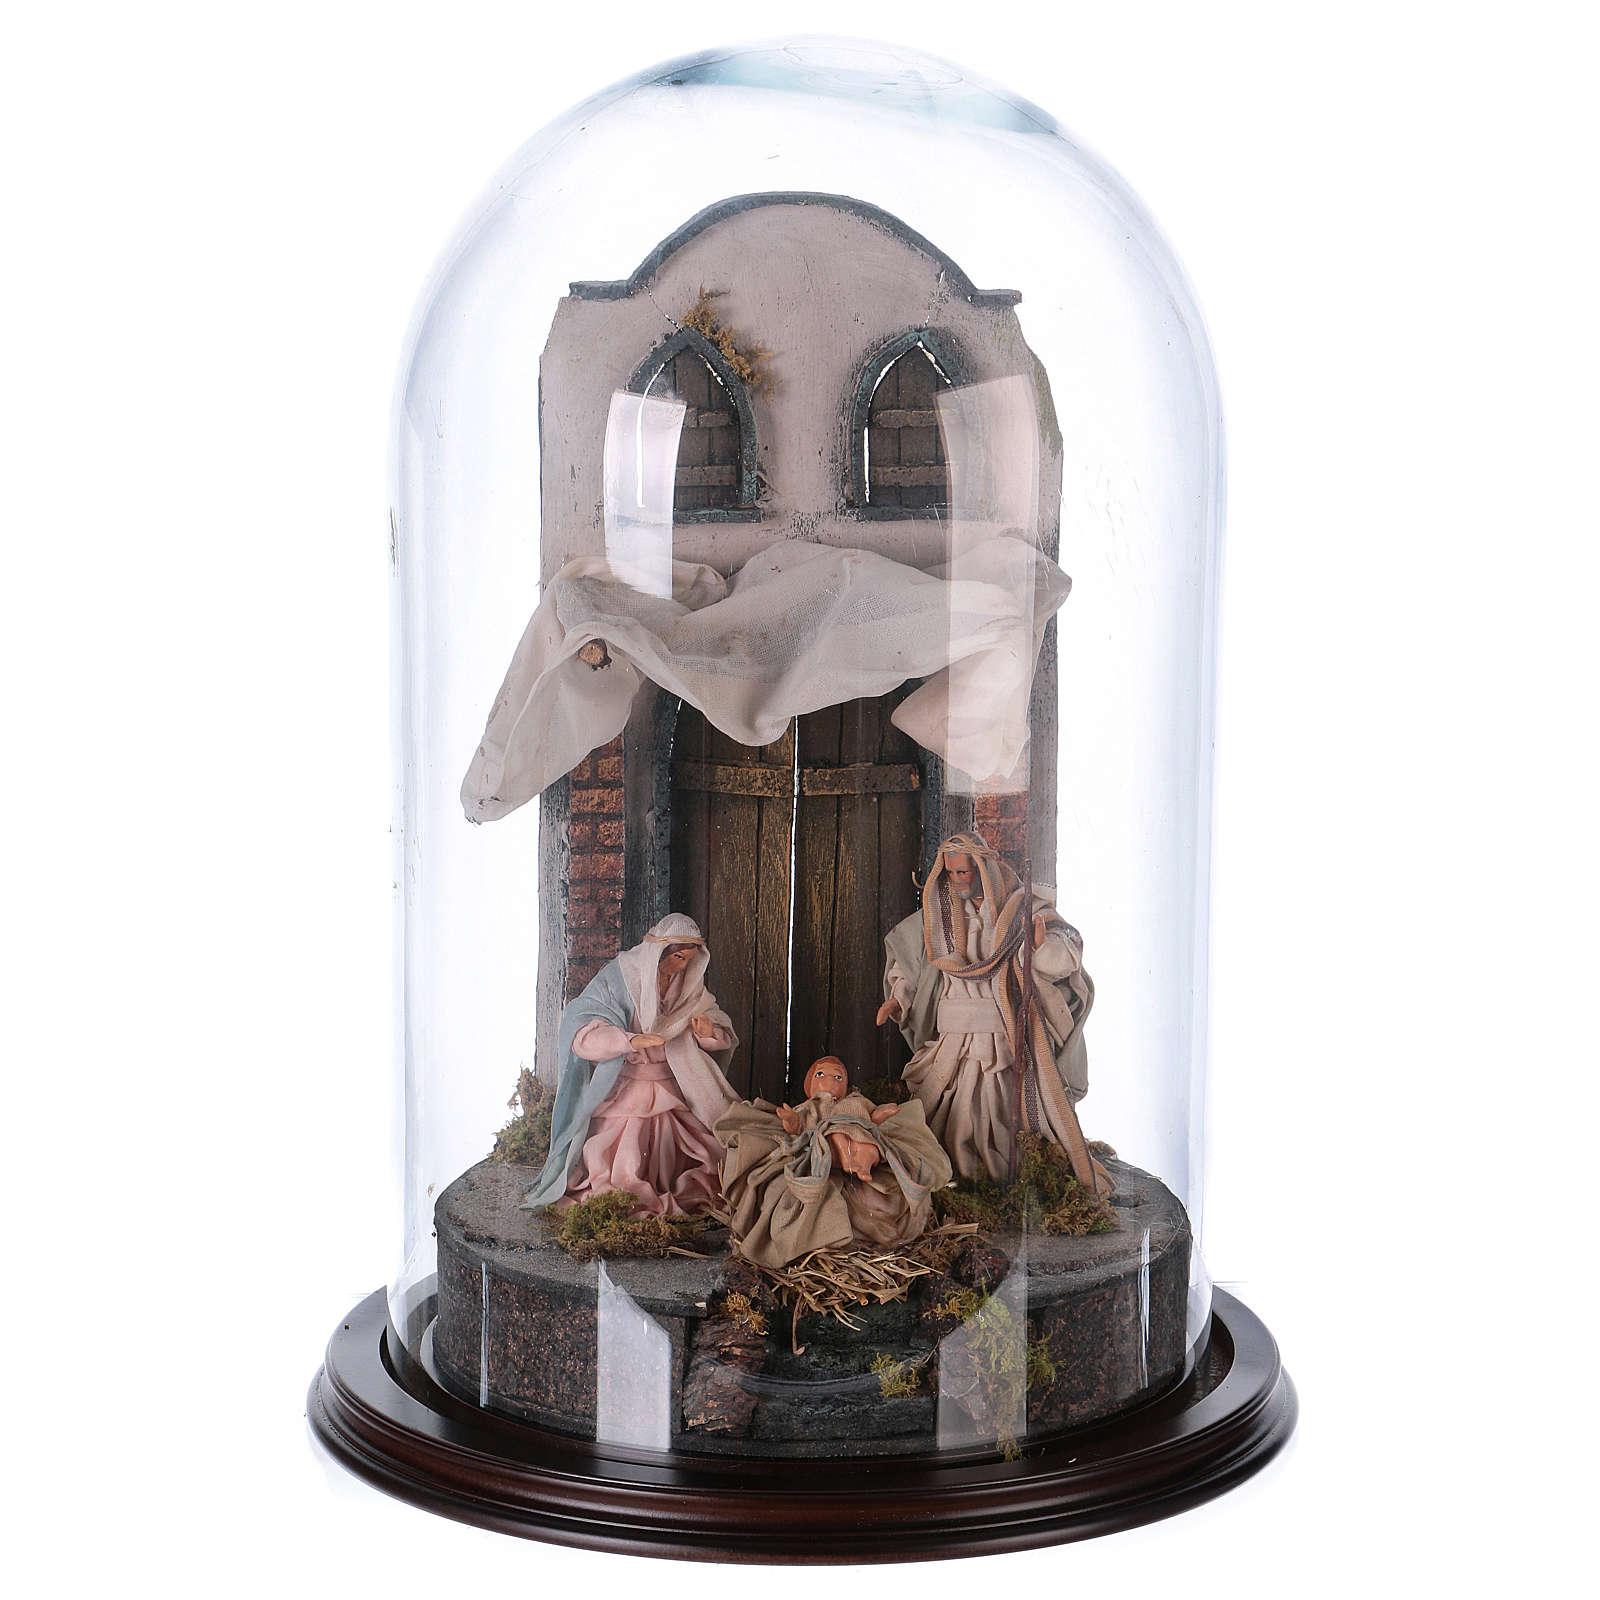 Sainte Famille terre cuite style arable 25x40cm cloche verre 4